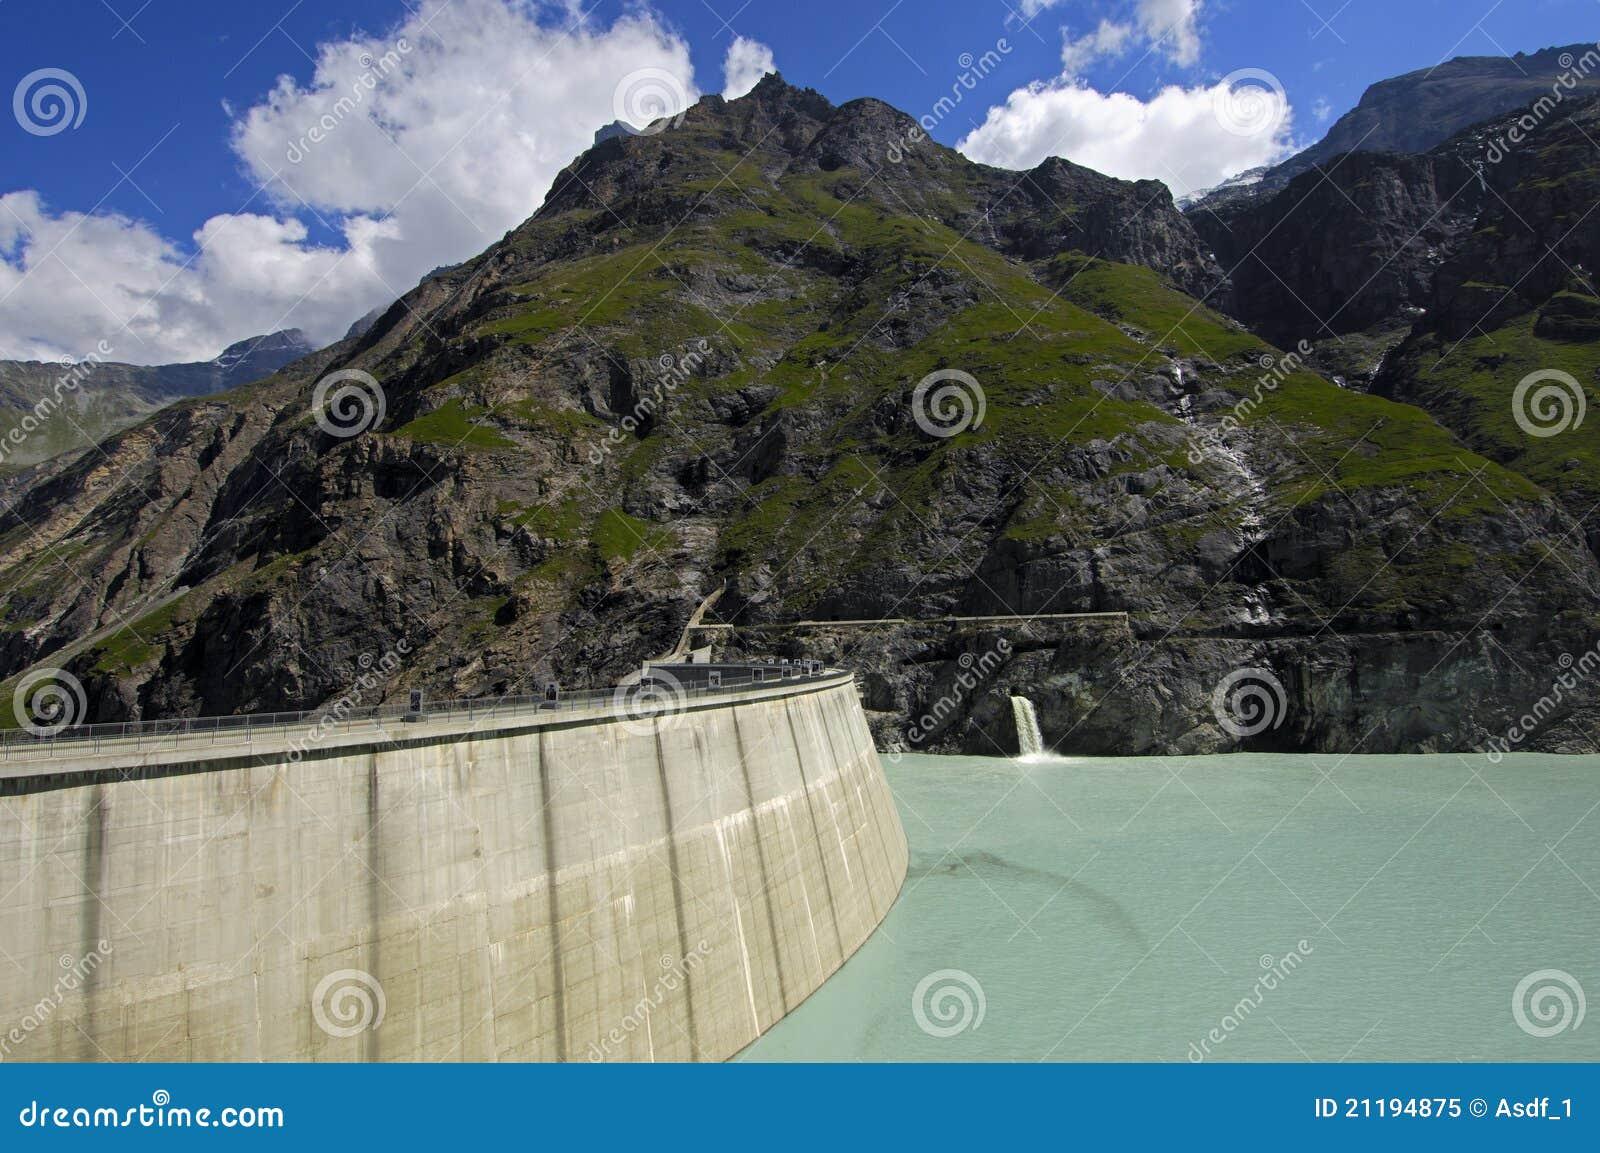 Dam of Lake Mauvoisin